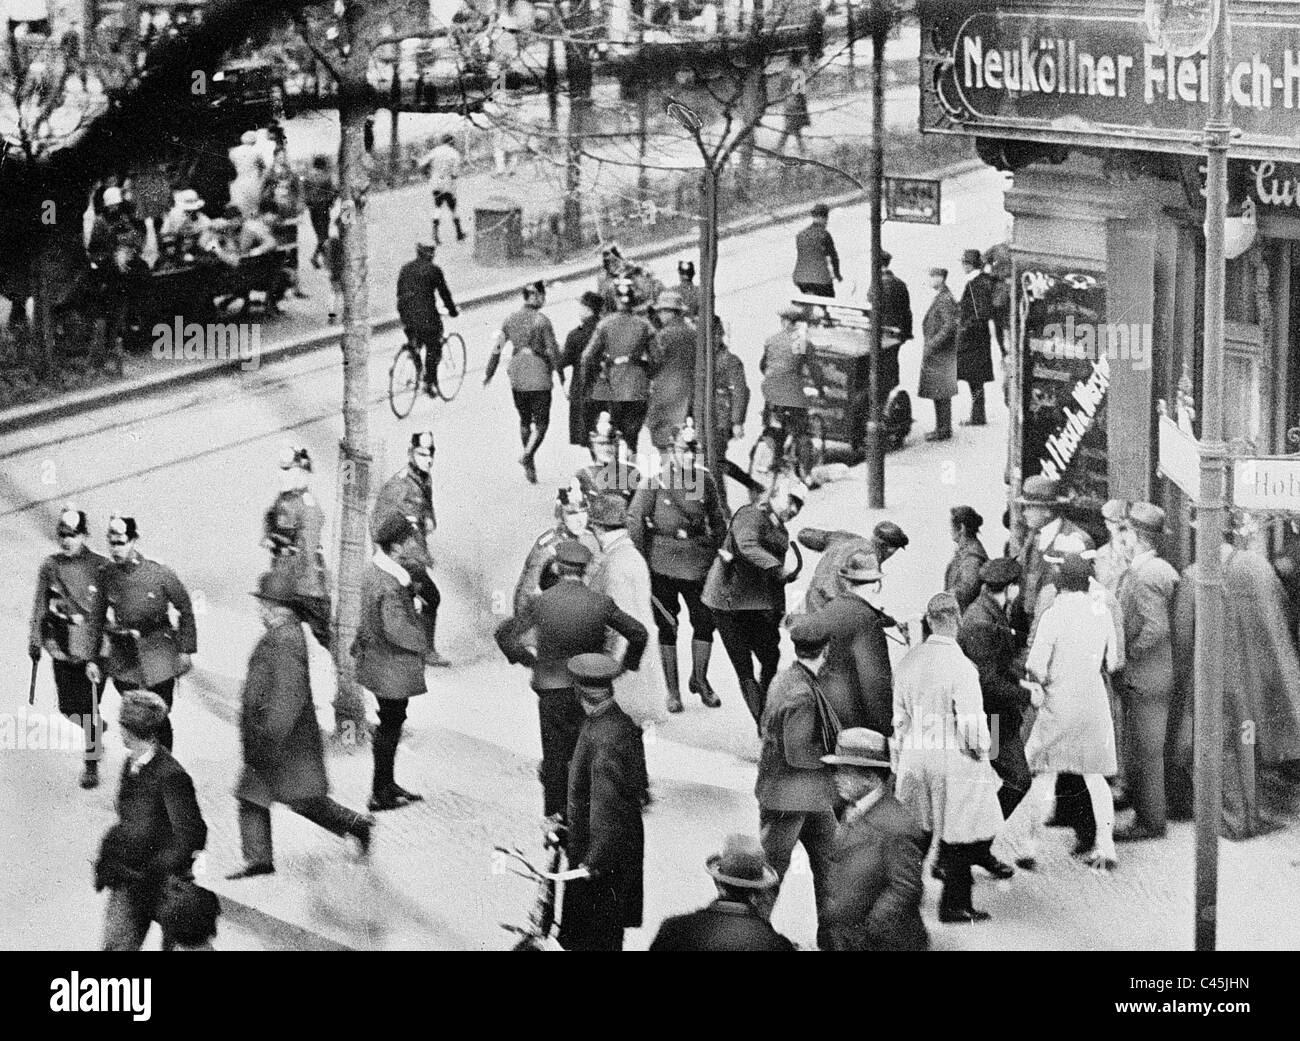 Street battles between the KPD and SA, 1929 Stock Photo